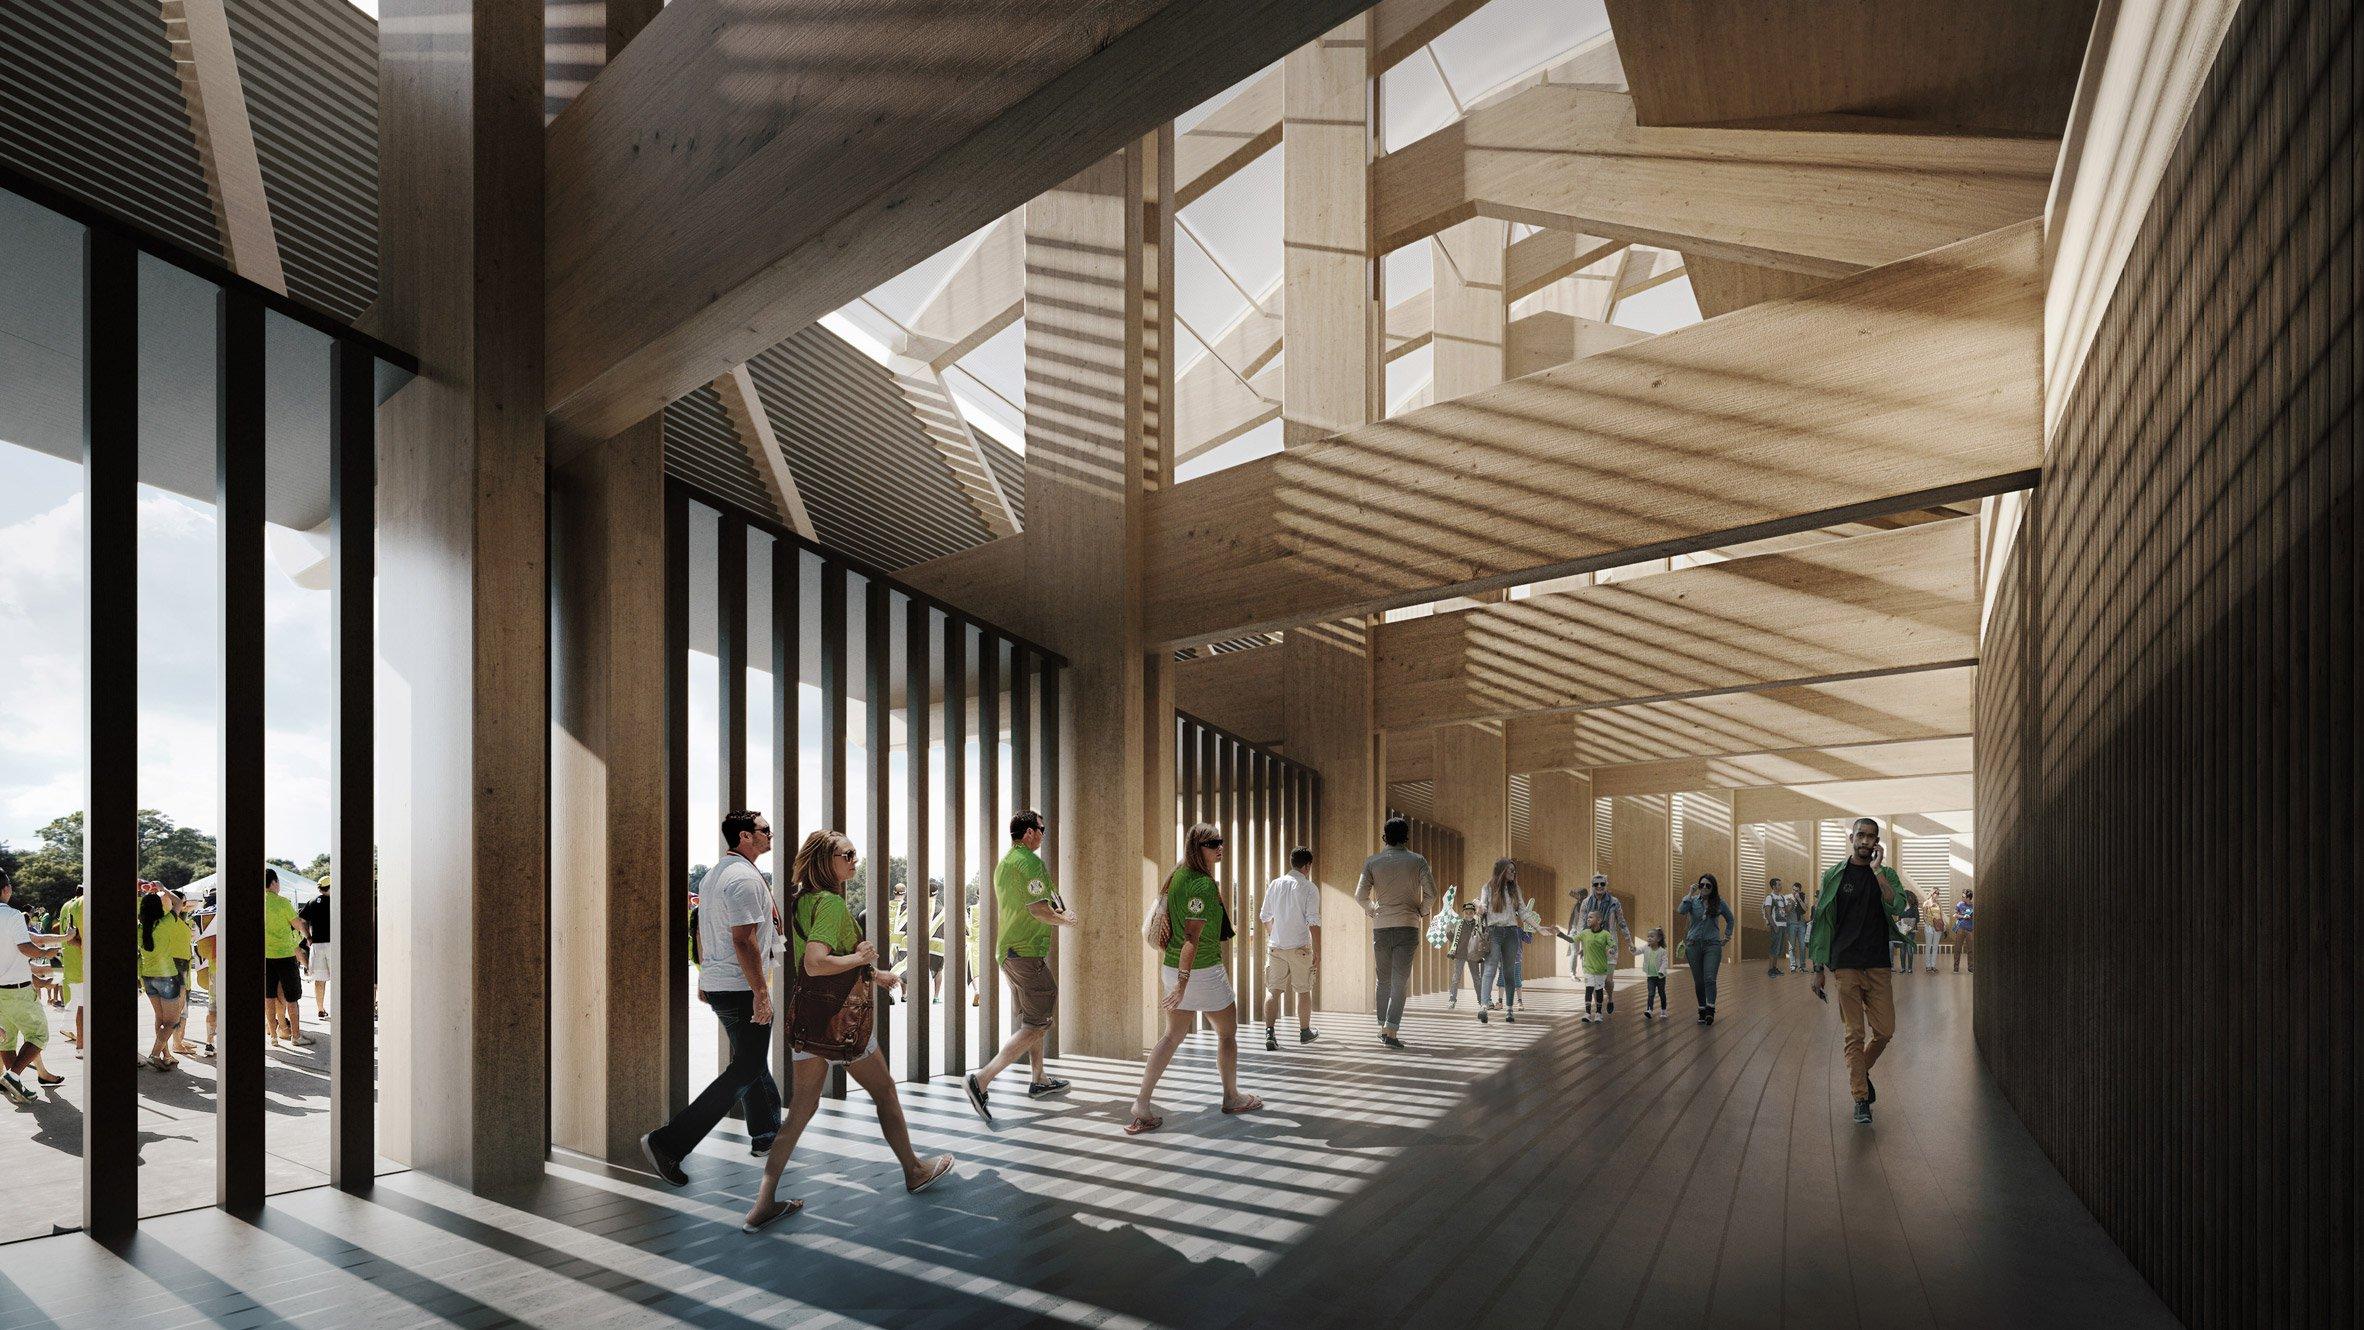 forest-green-rovers-eco-park-football-soccer-stadium-architecture-news-zaha-hadid-architects-stroud-gloucestershire-england-uk_dezeen_2364_col_2